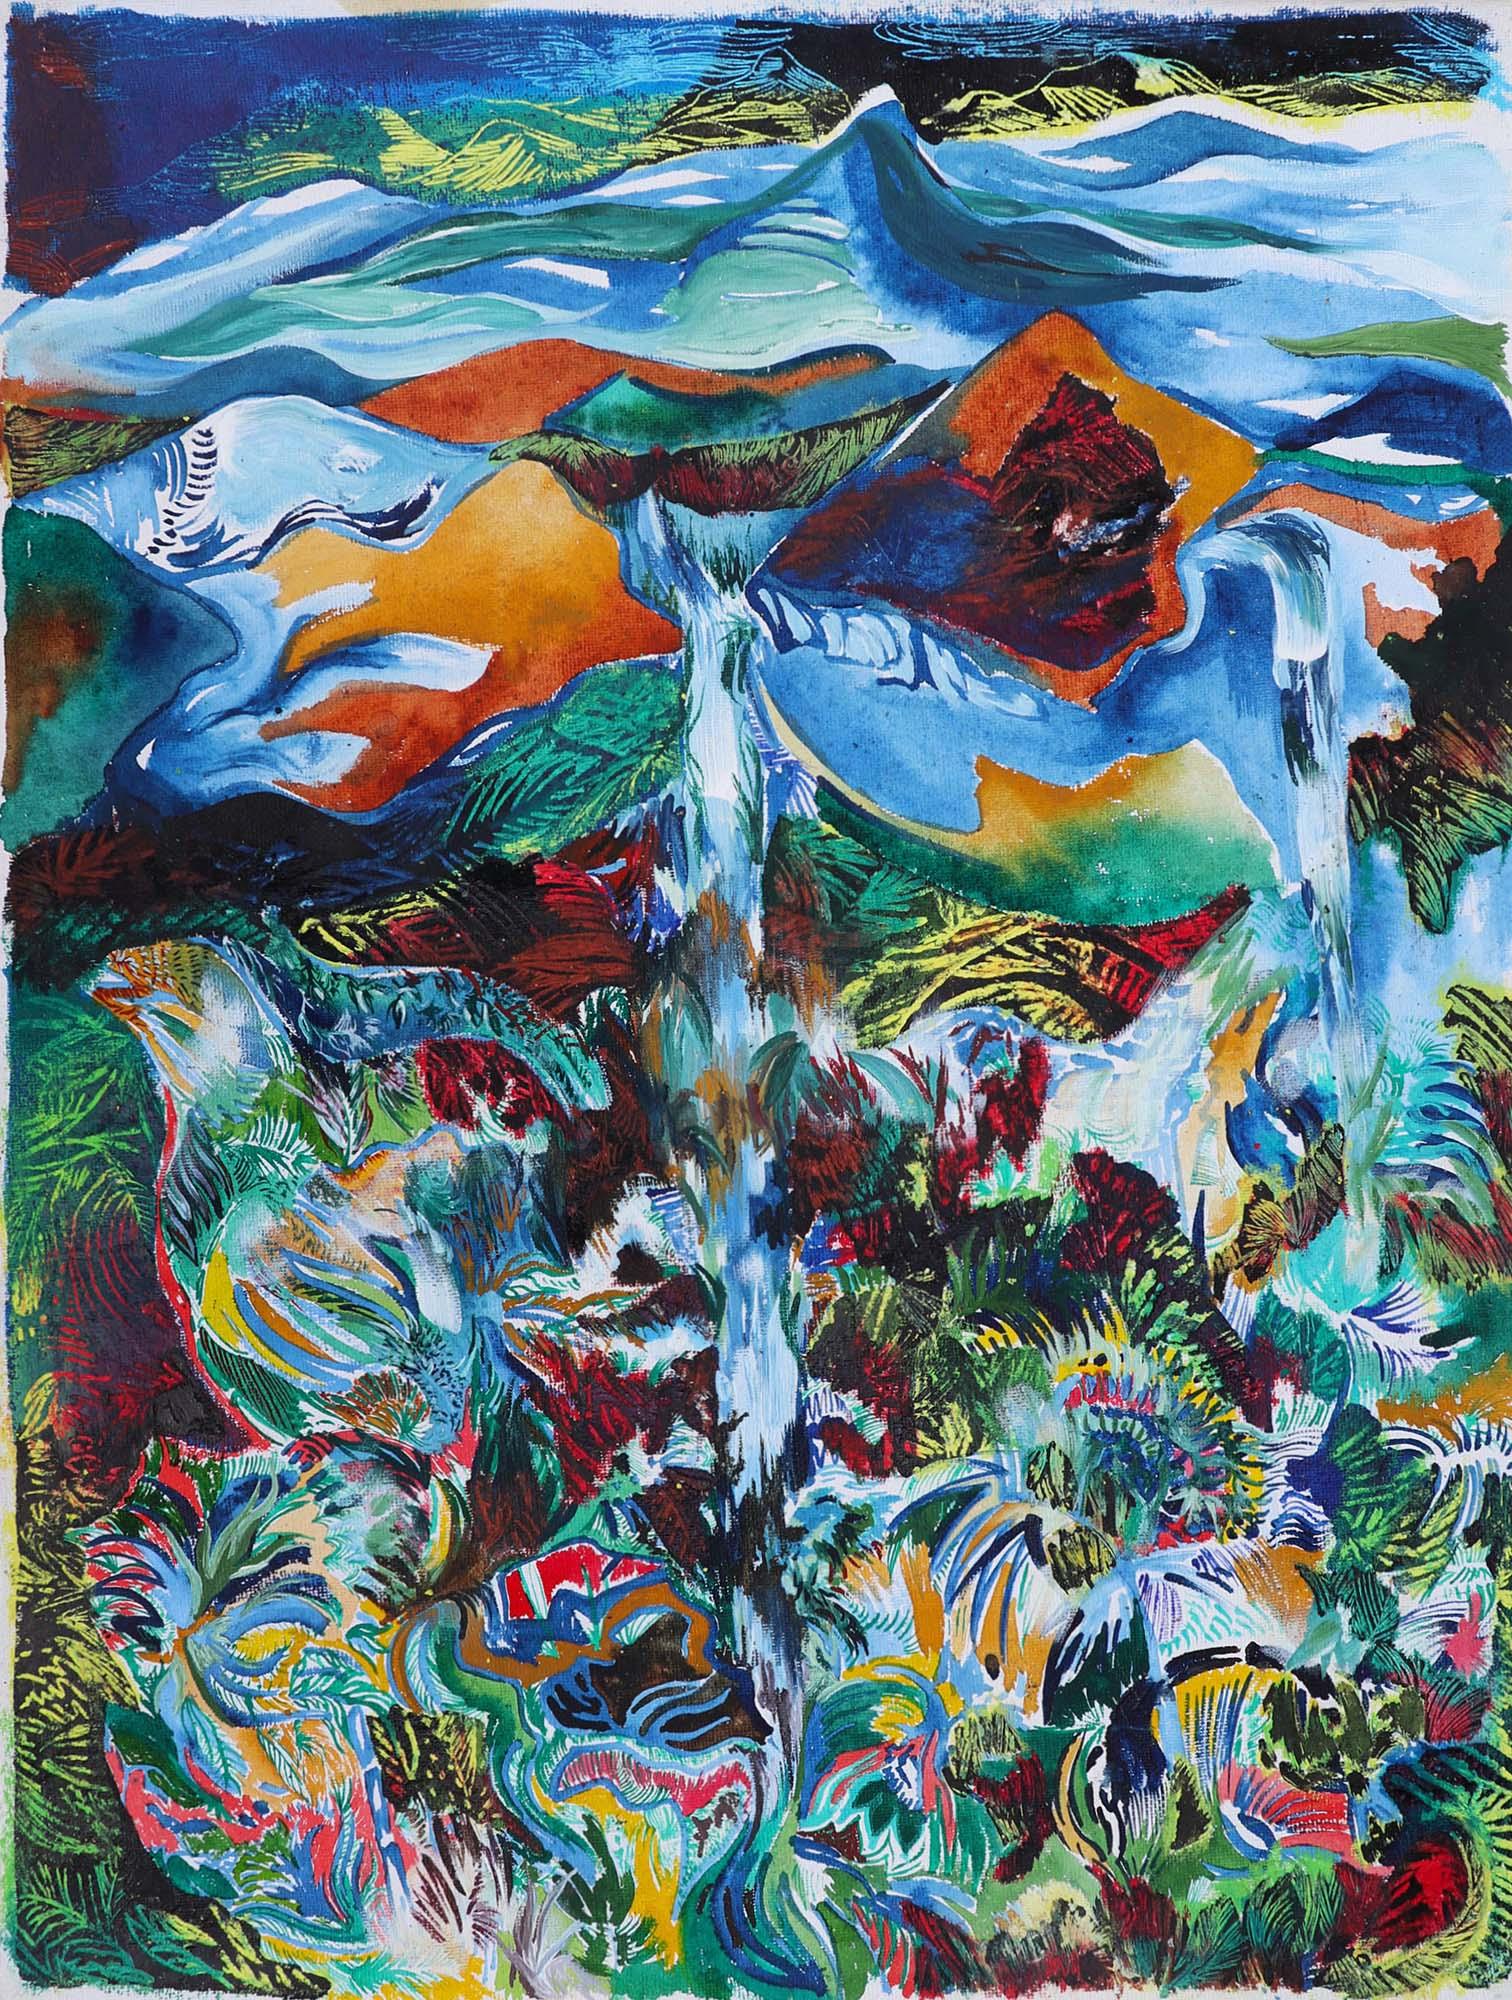 Barbora Chlastakova, Nokhalikai Falls, Mix media on handmade paper, 80 x 60 cm, 2016